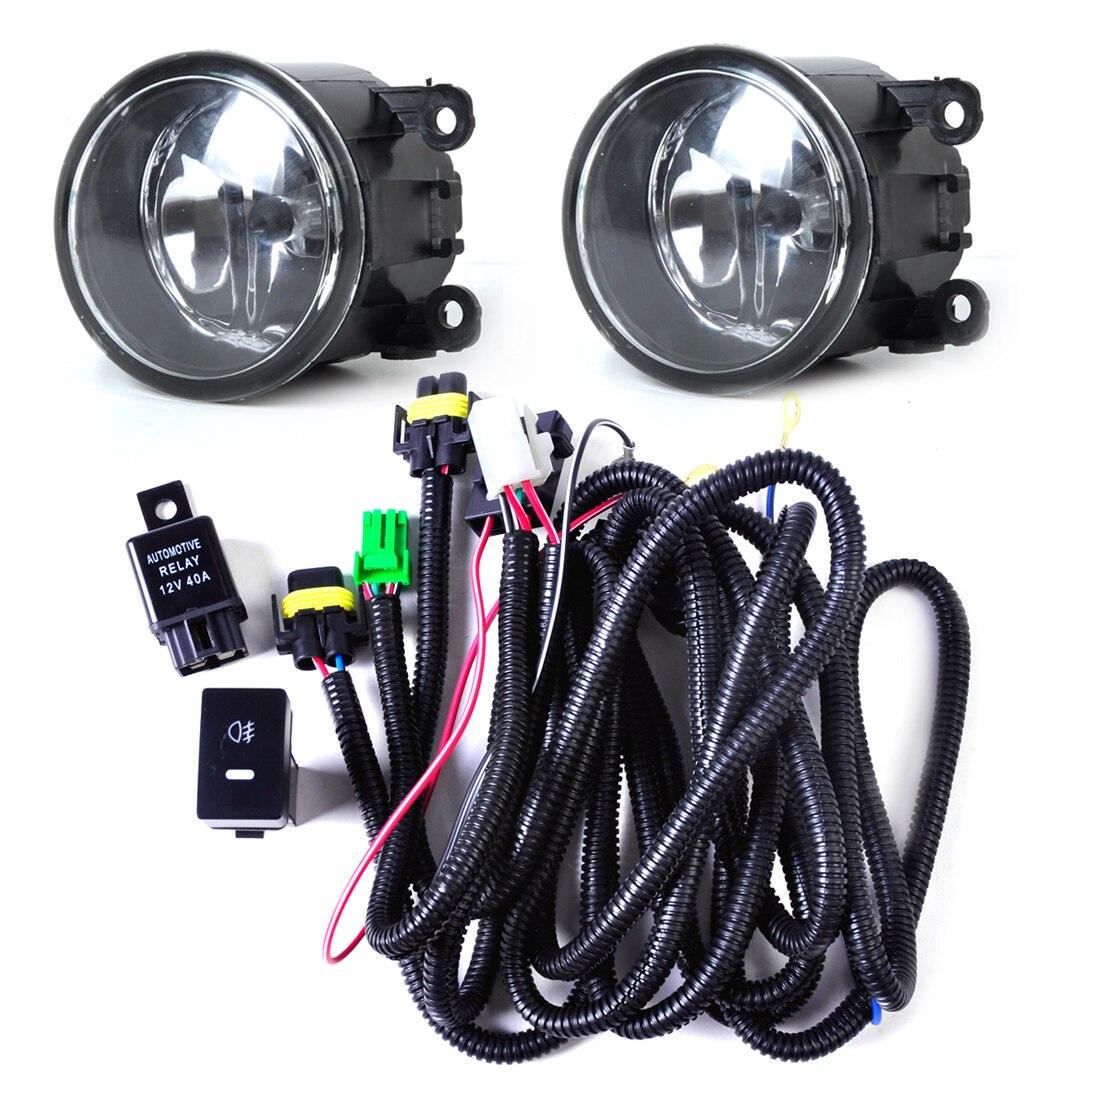 Led wiring diagram car wiring diagrams online - Mazda 3 Fog Light Wiring Harness Free Download Fog